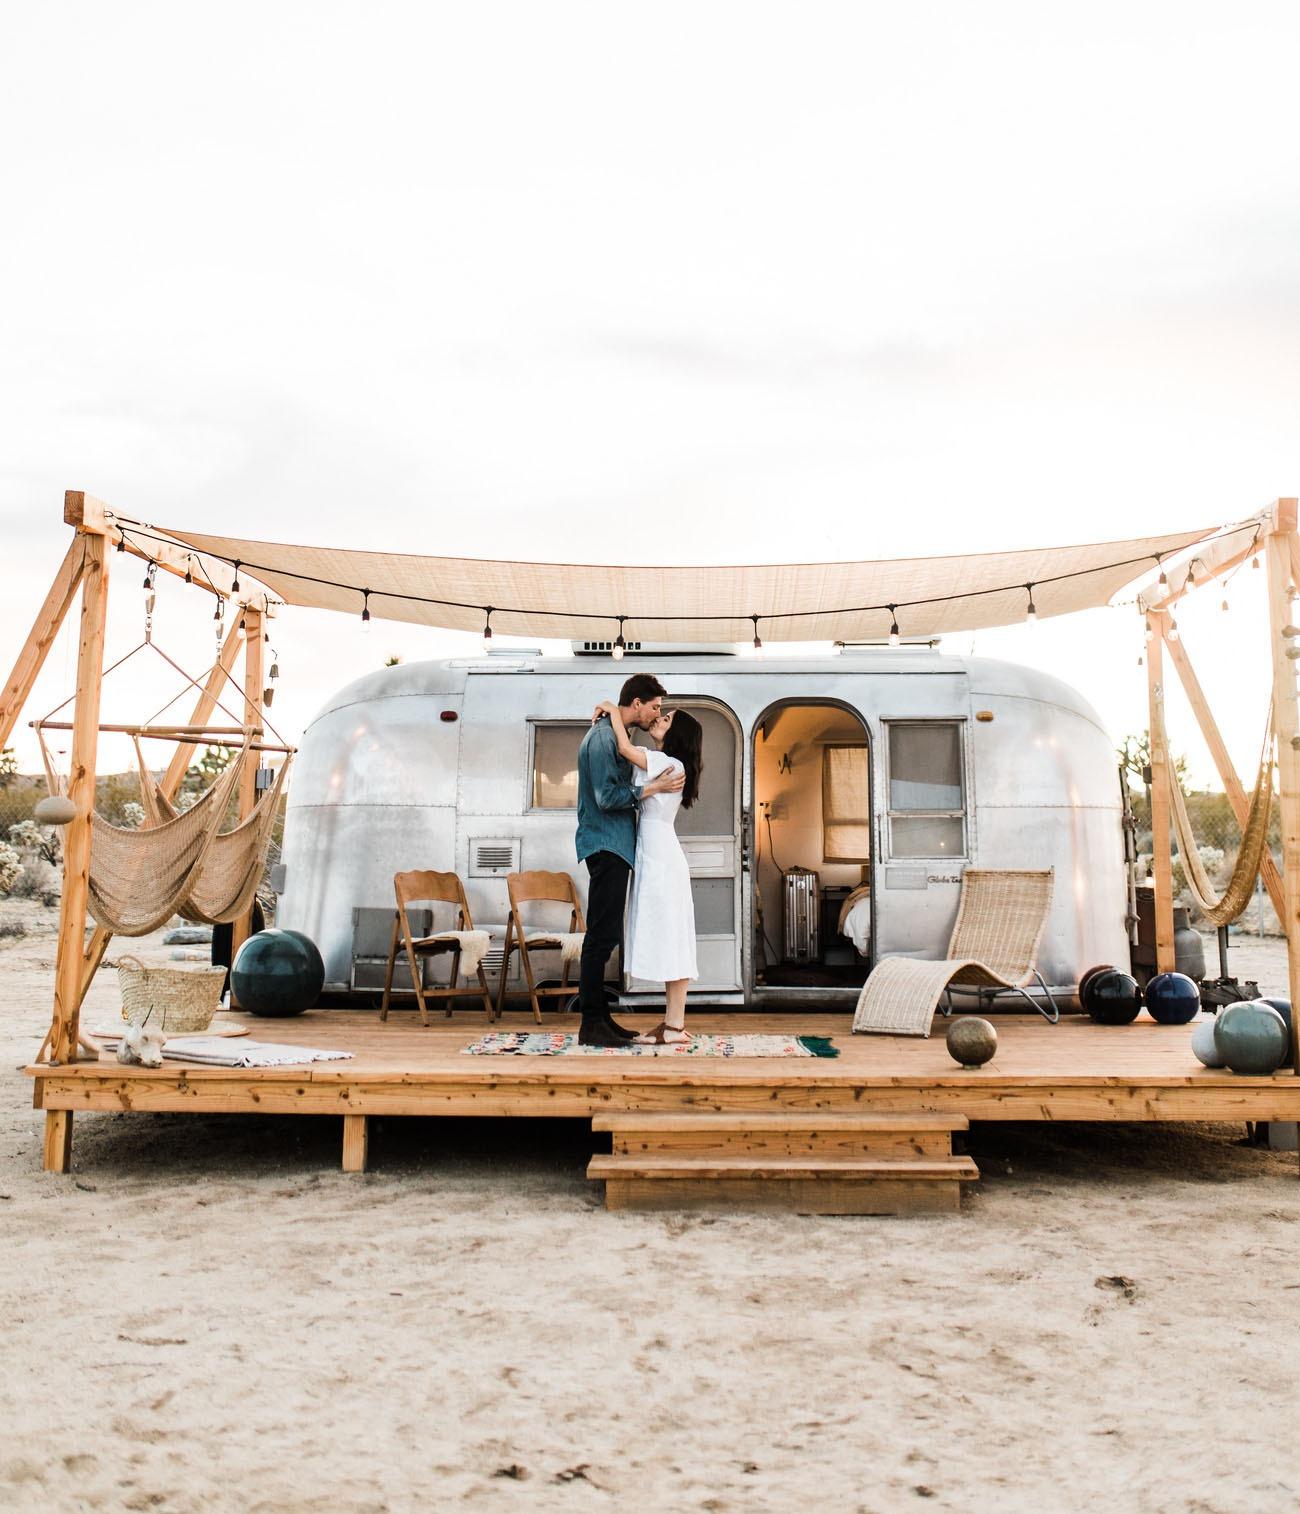 Joshua Tree Airstream trailer honeymoon destinations in the US